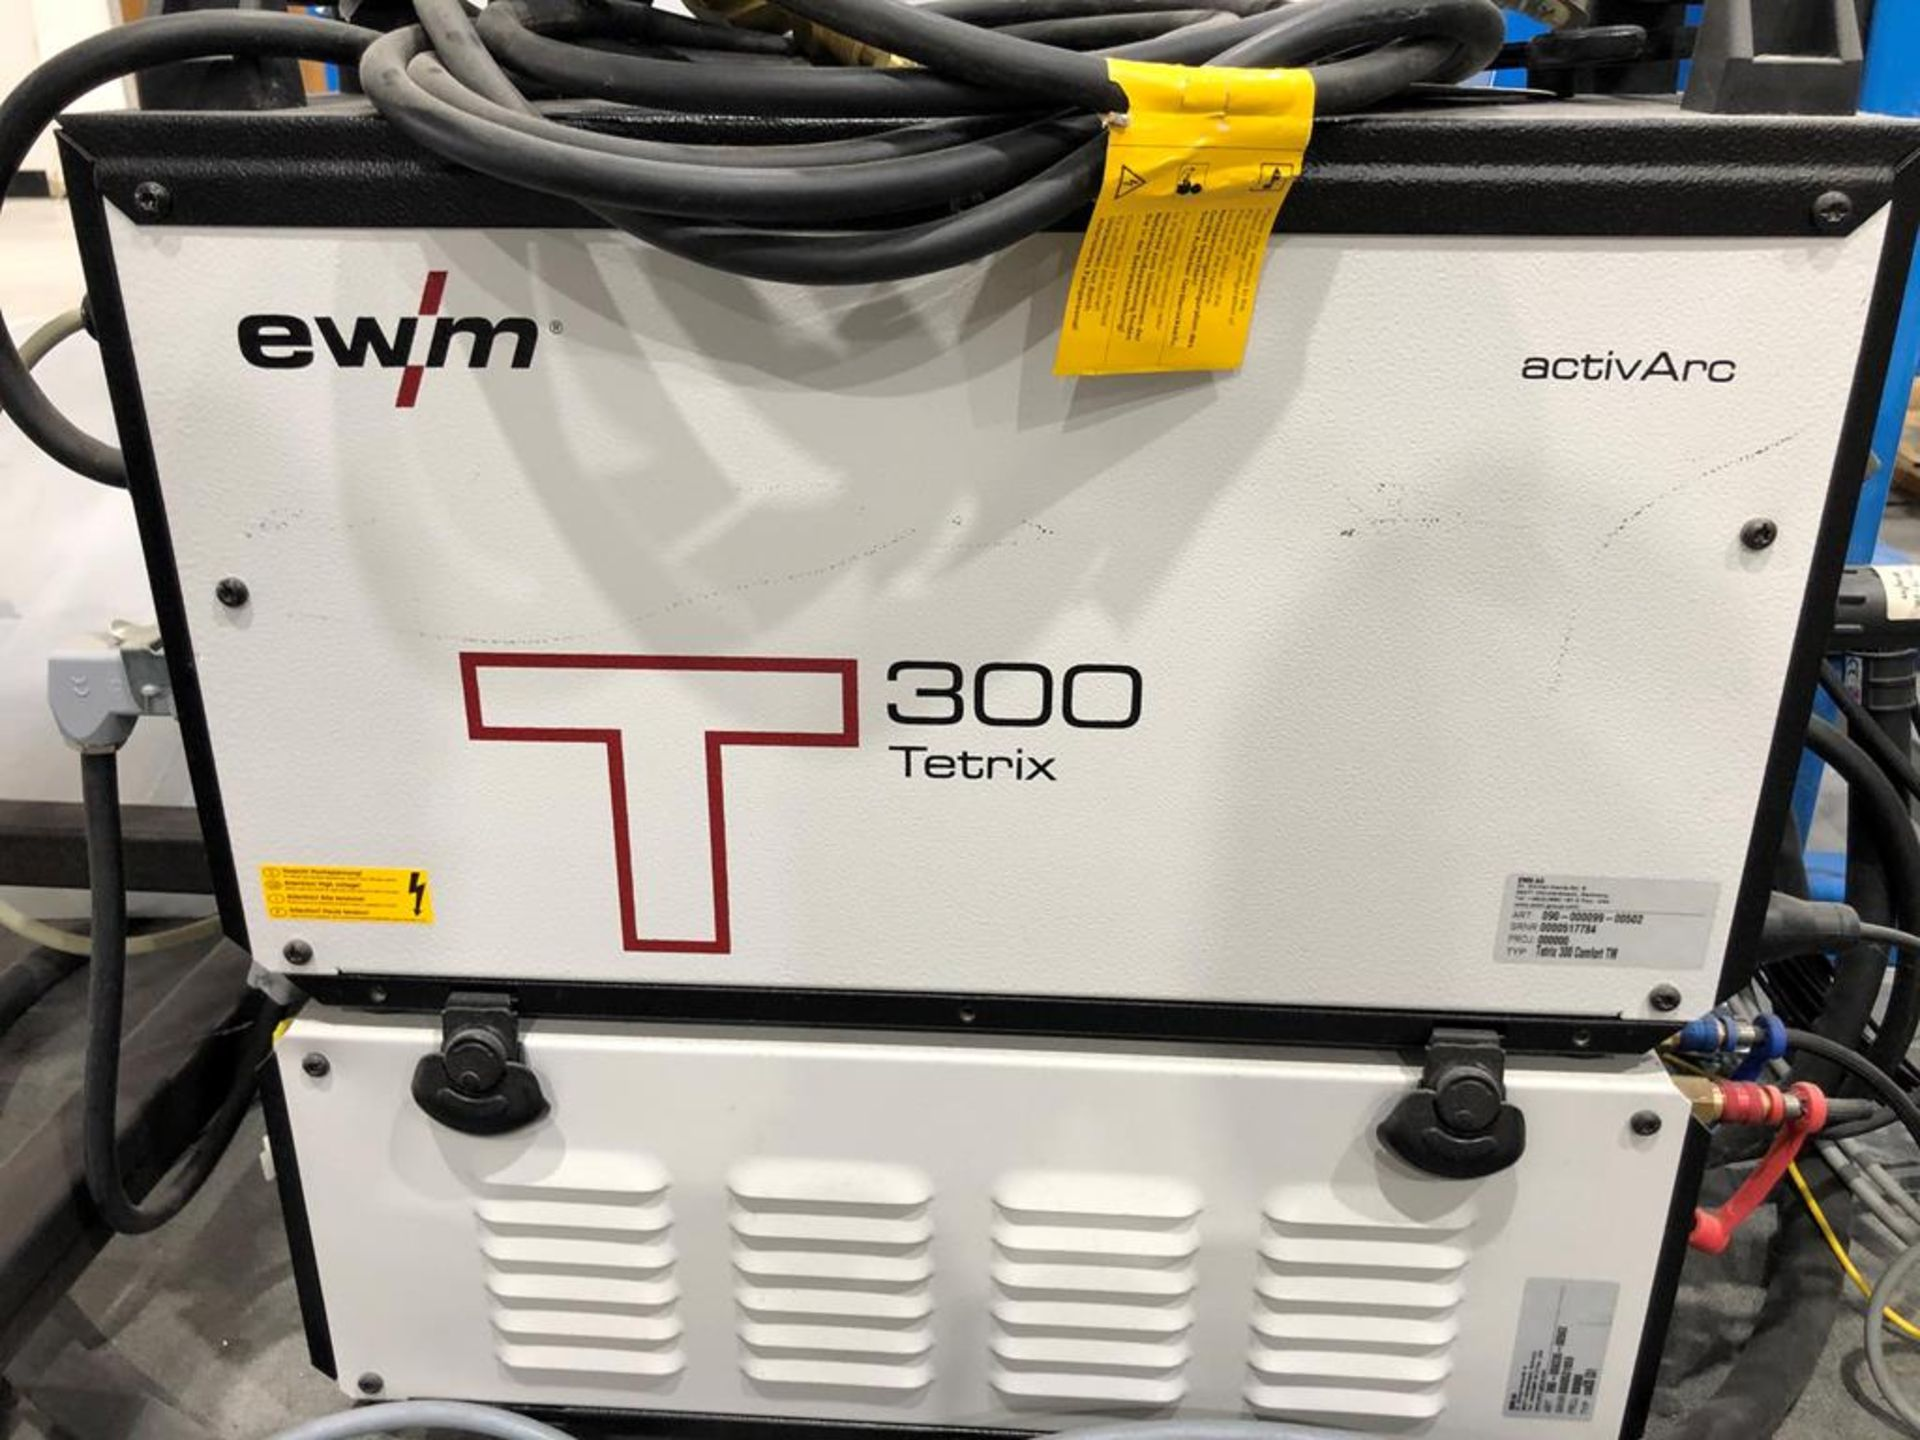 Unused 2017 EWM Tetrix 300 Comfort TM TIG DC Welding Machine - Image 2 of 3